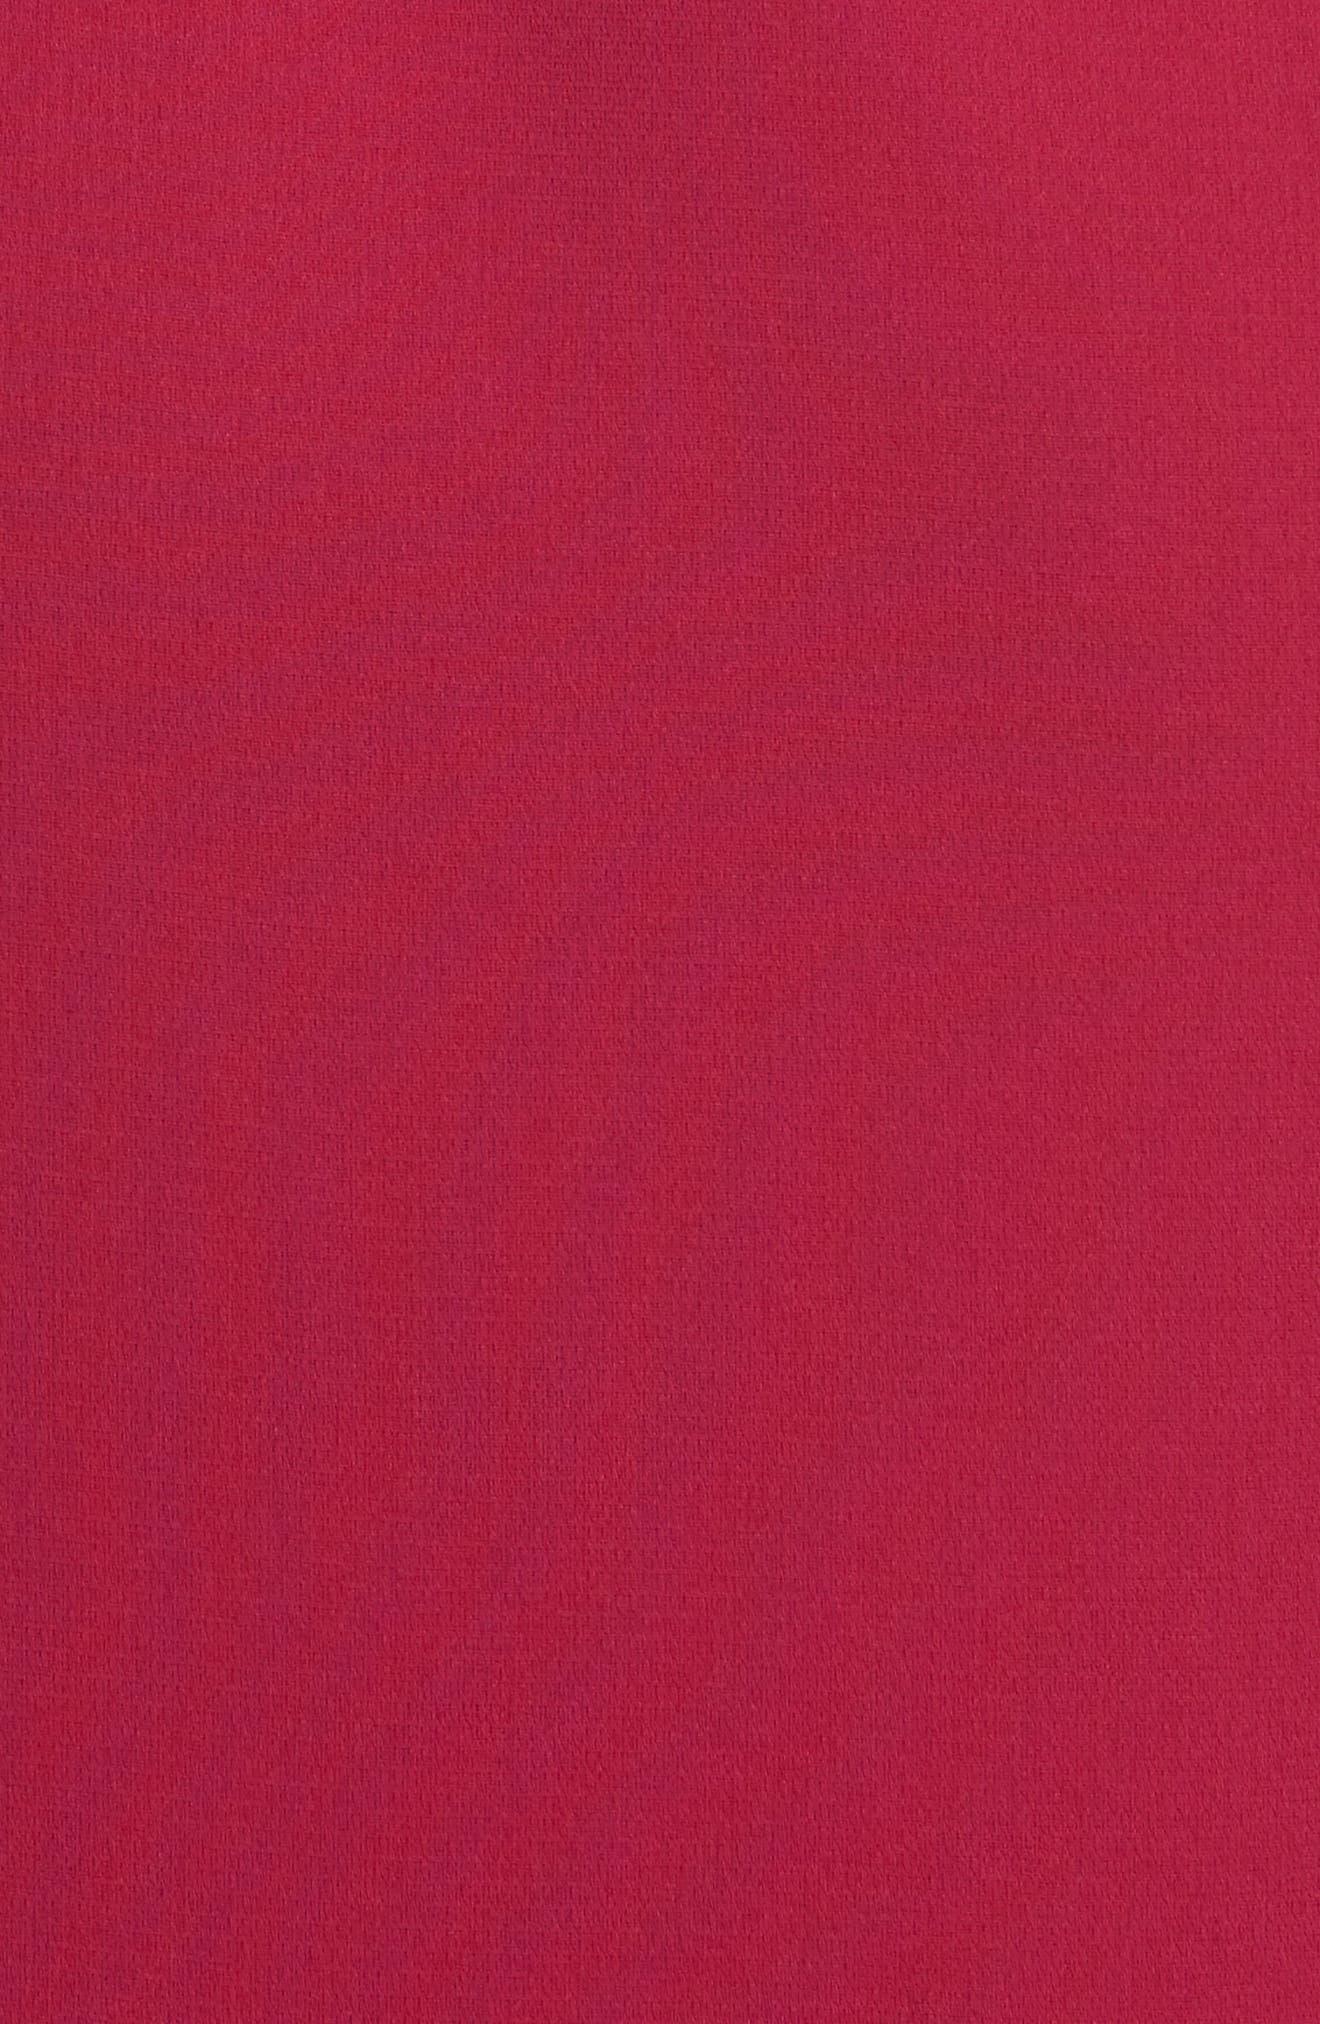 Ezana Ruffle Strapless Mermaid Dress,                             Alternate thumbnail 5, color,                             698